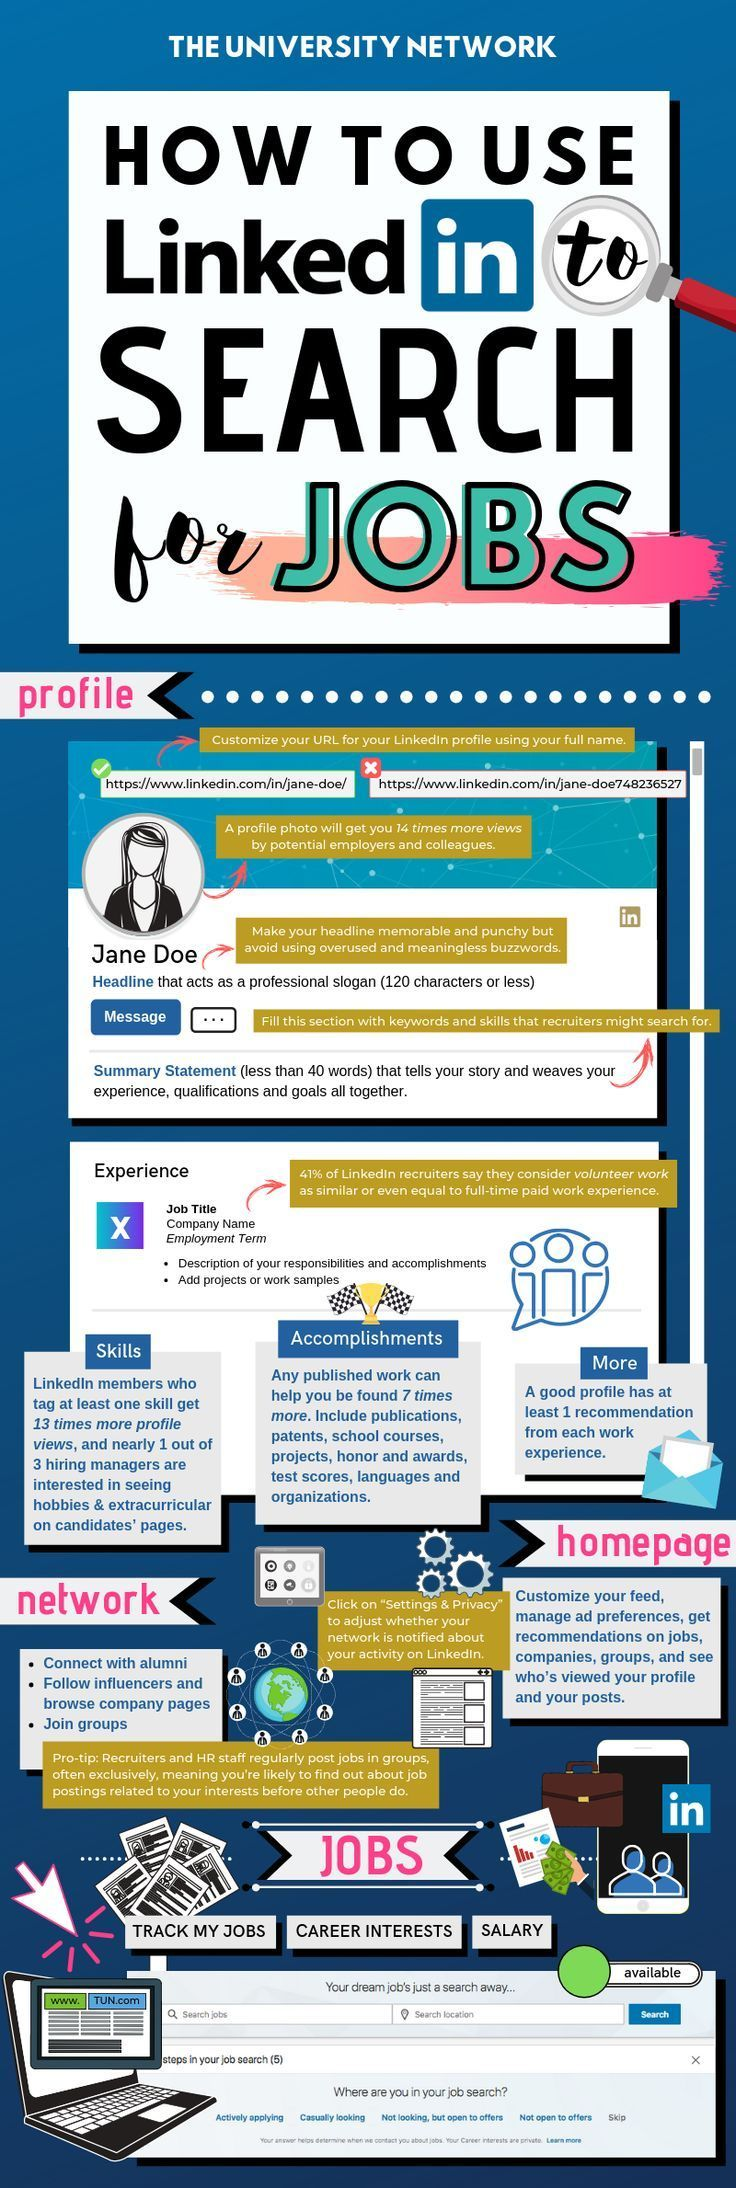 LinkedIn Job Search For College Students Linkedin job